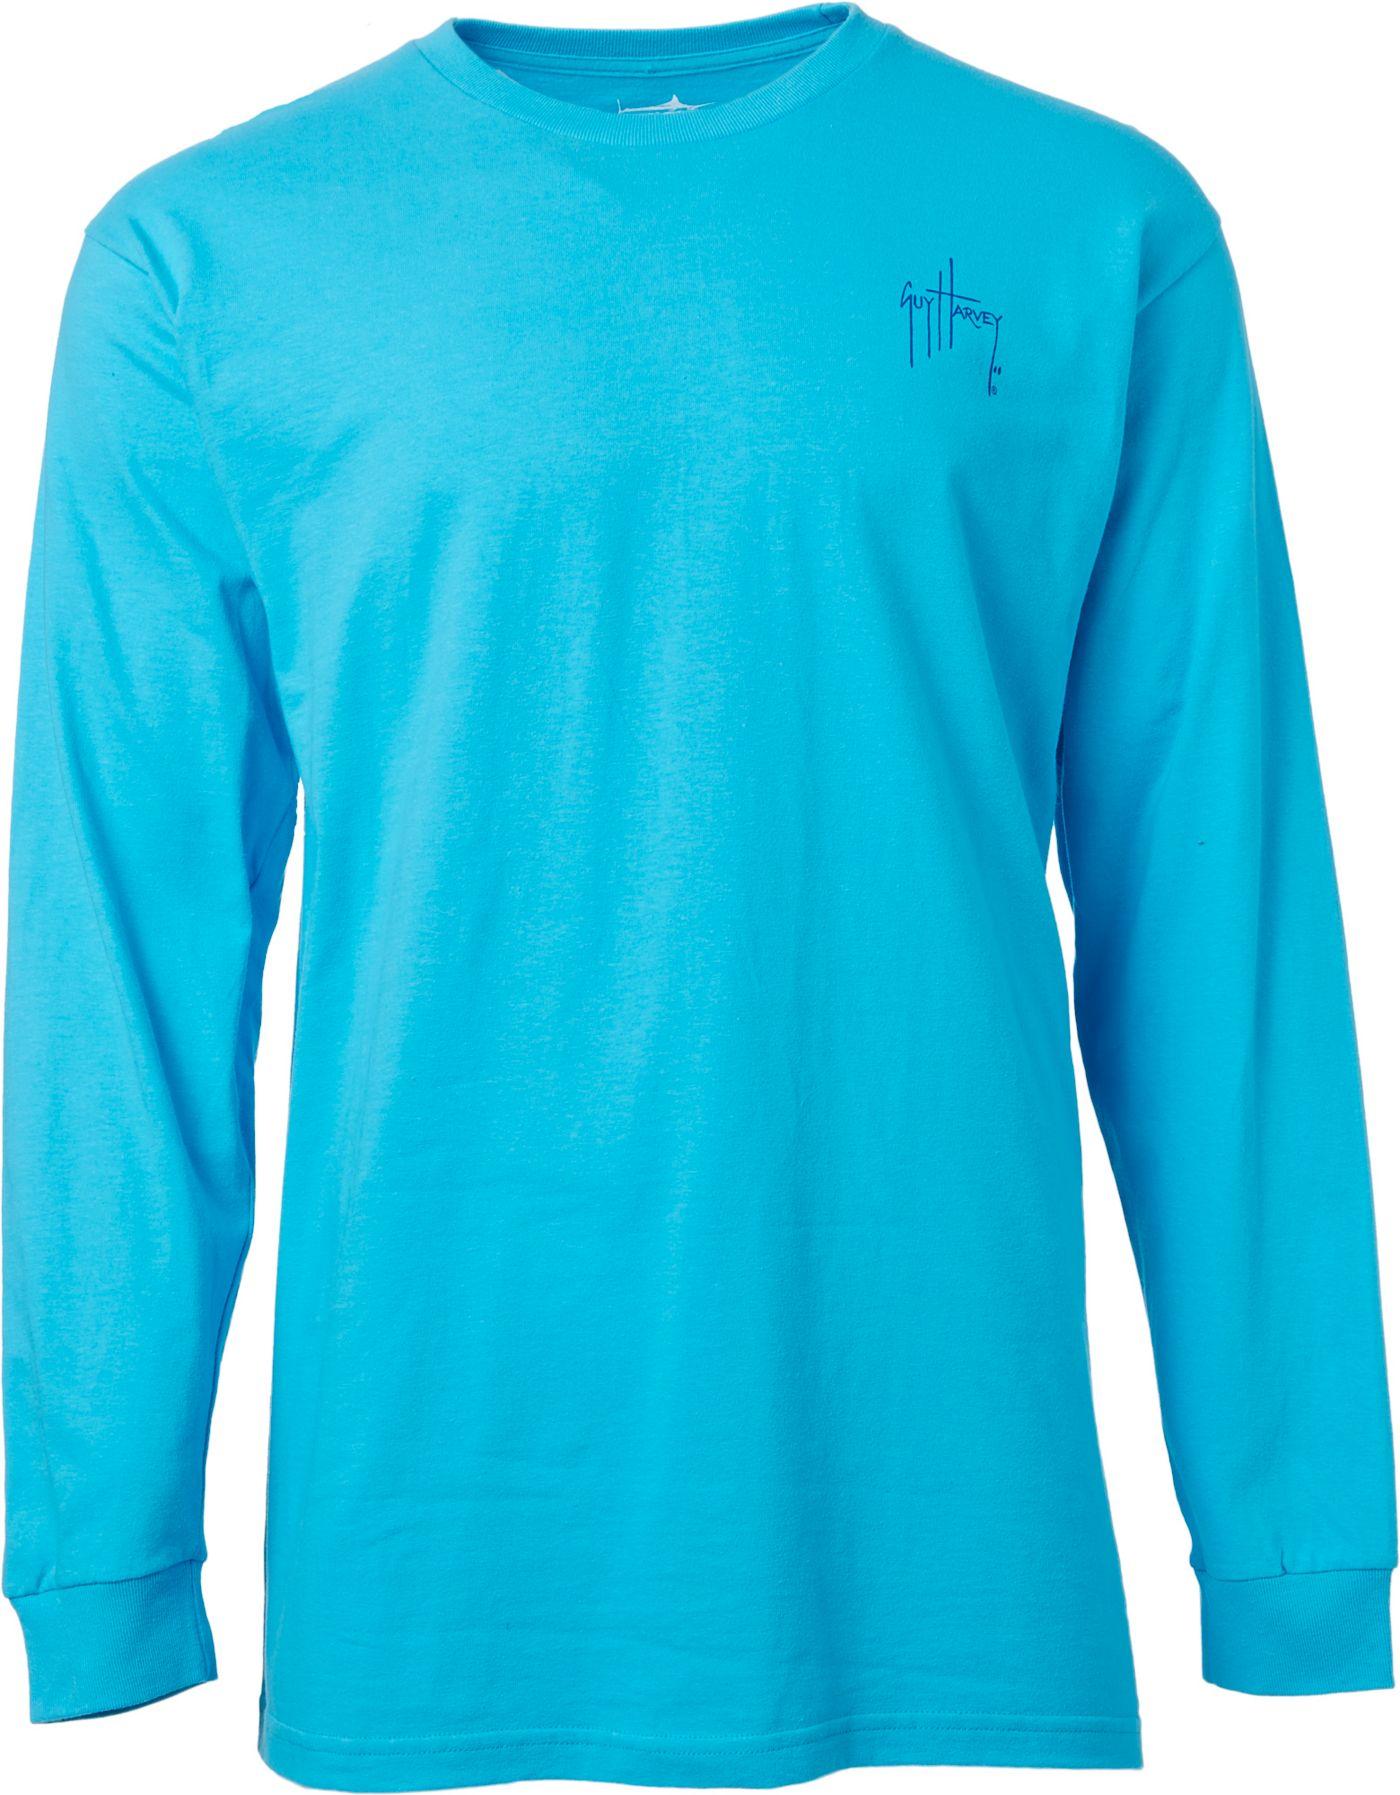 Guy Harvey Men's GH Logo Long Sleeve Shirt